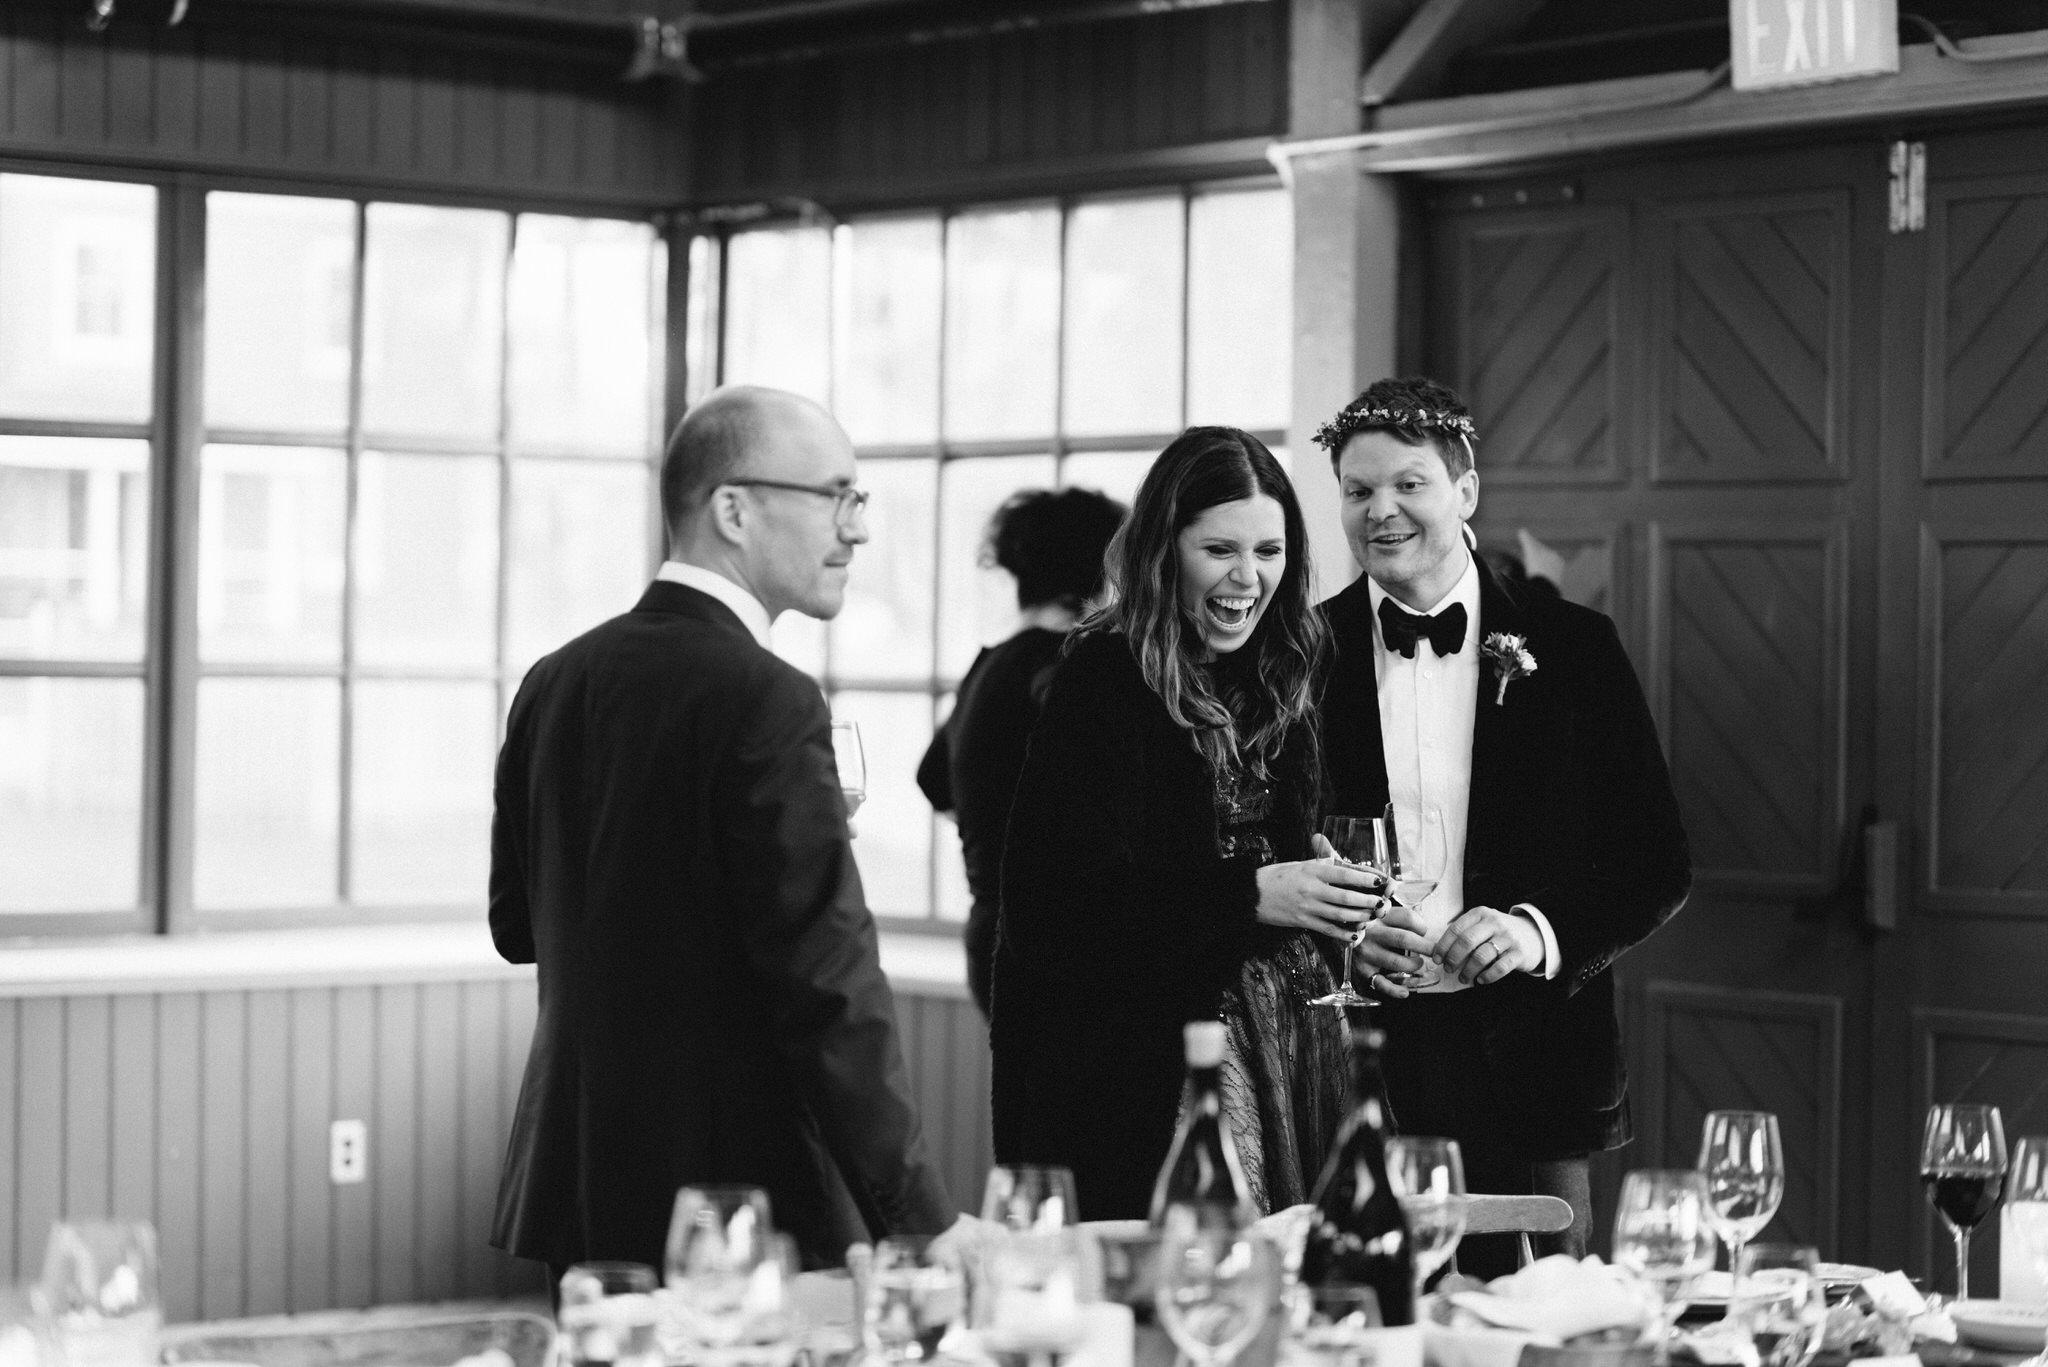 scarletoneillphotography_weddingphotography_prince edward county weddings146.JPG